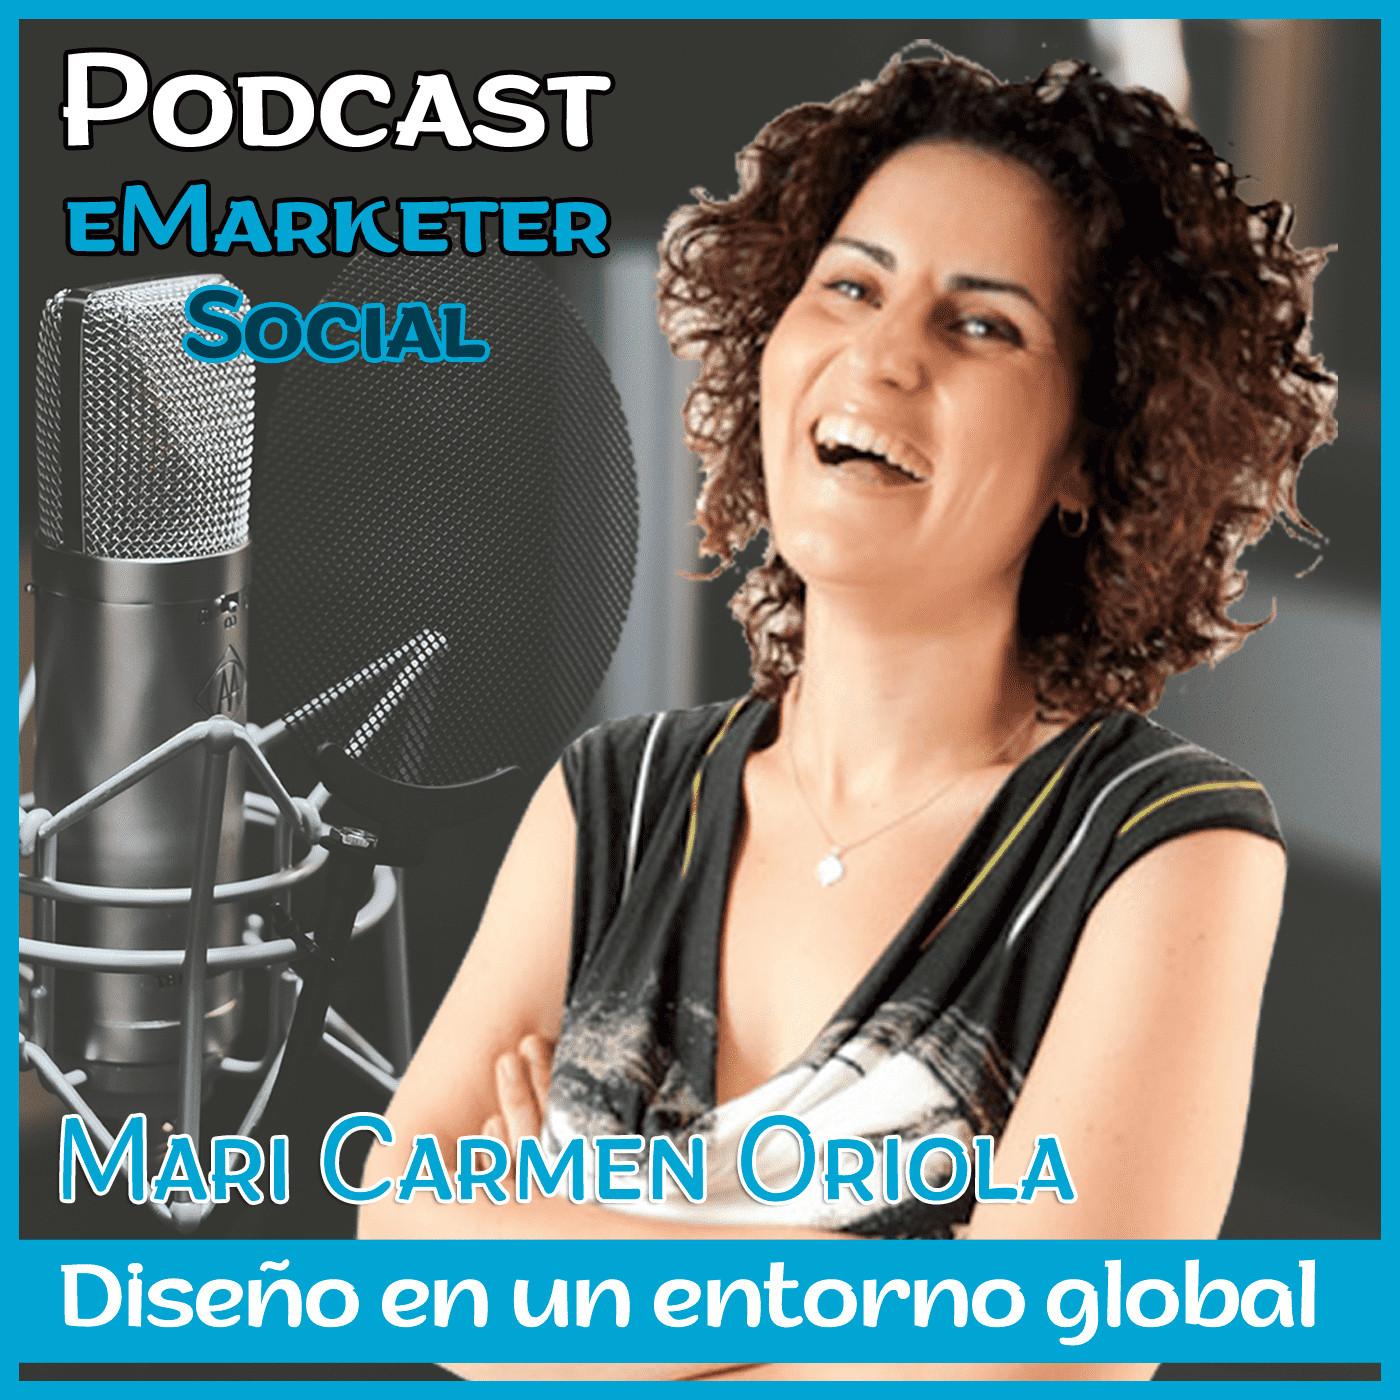 079 Mari Carmen Oriola diseñadora en un entorno global en Podcast eMarketerSocial